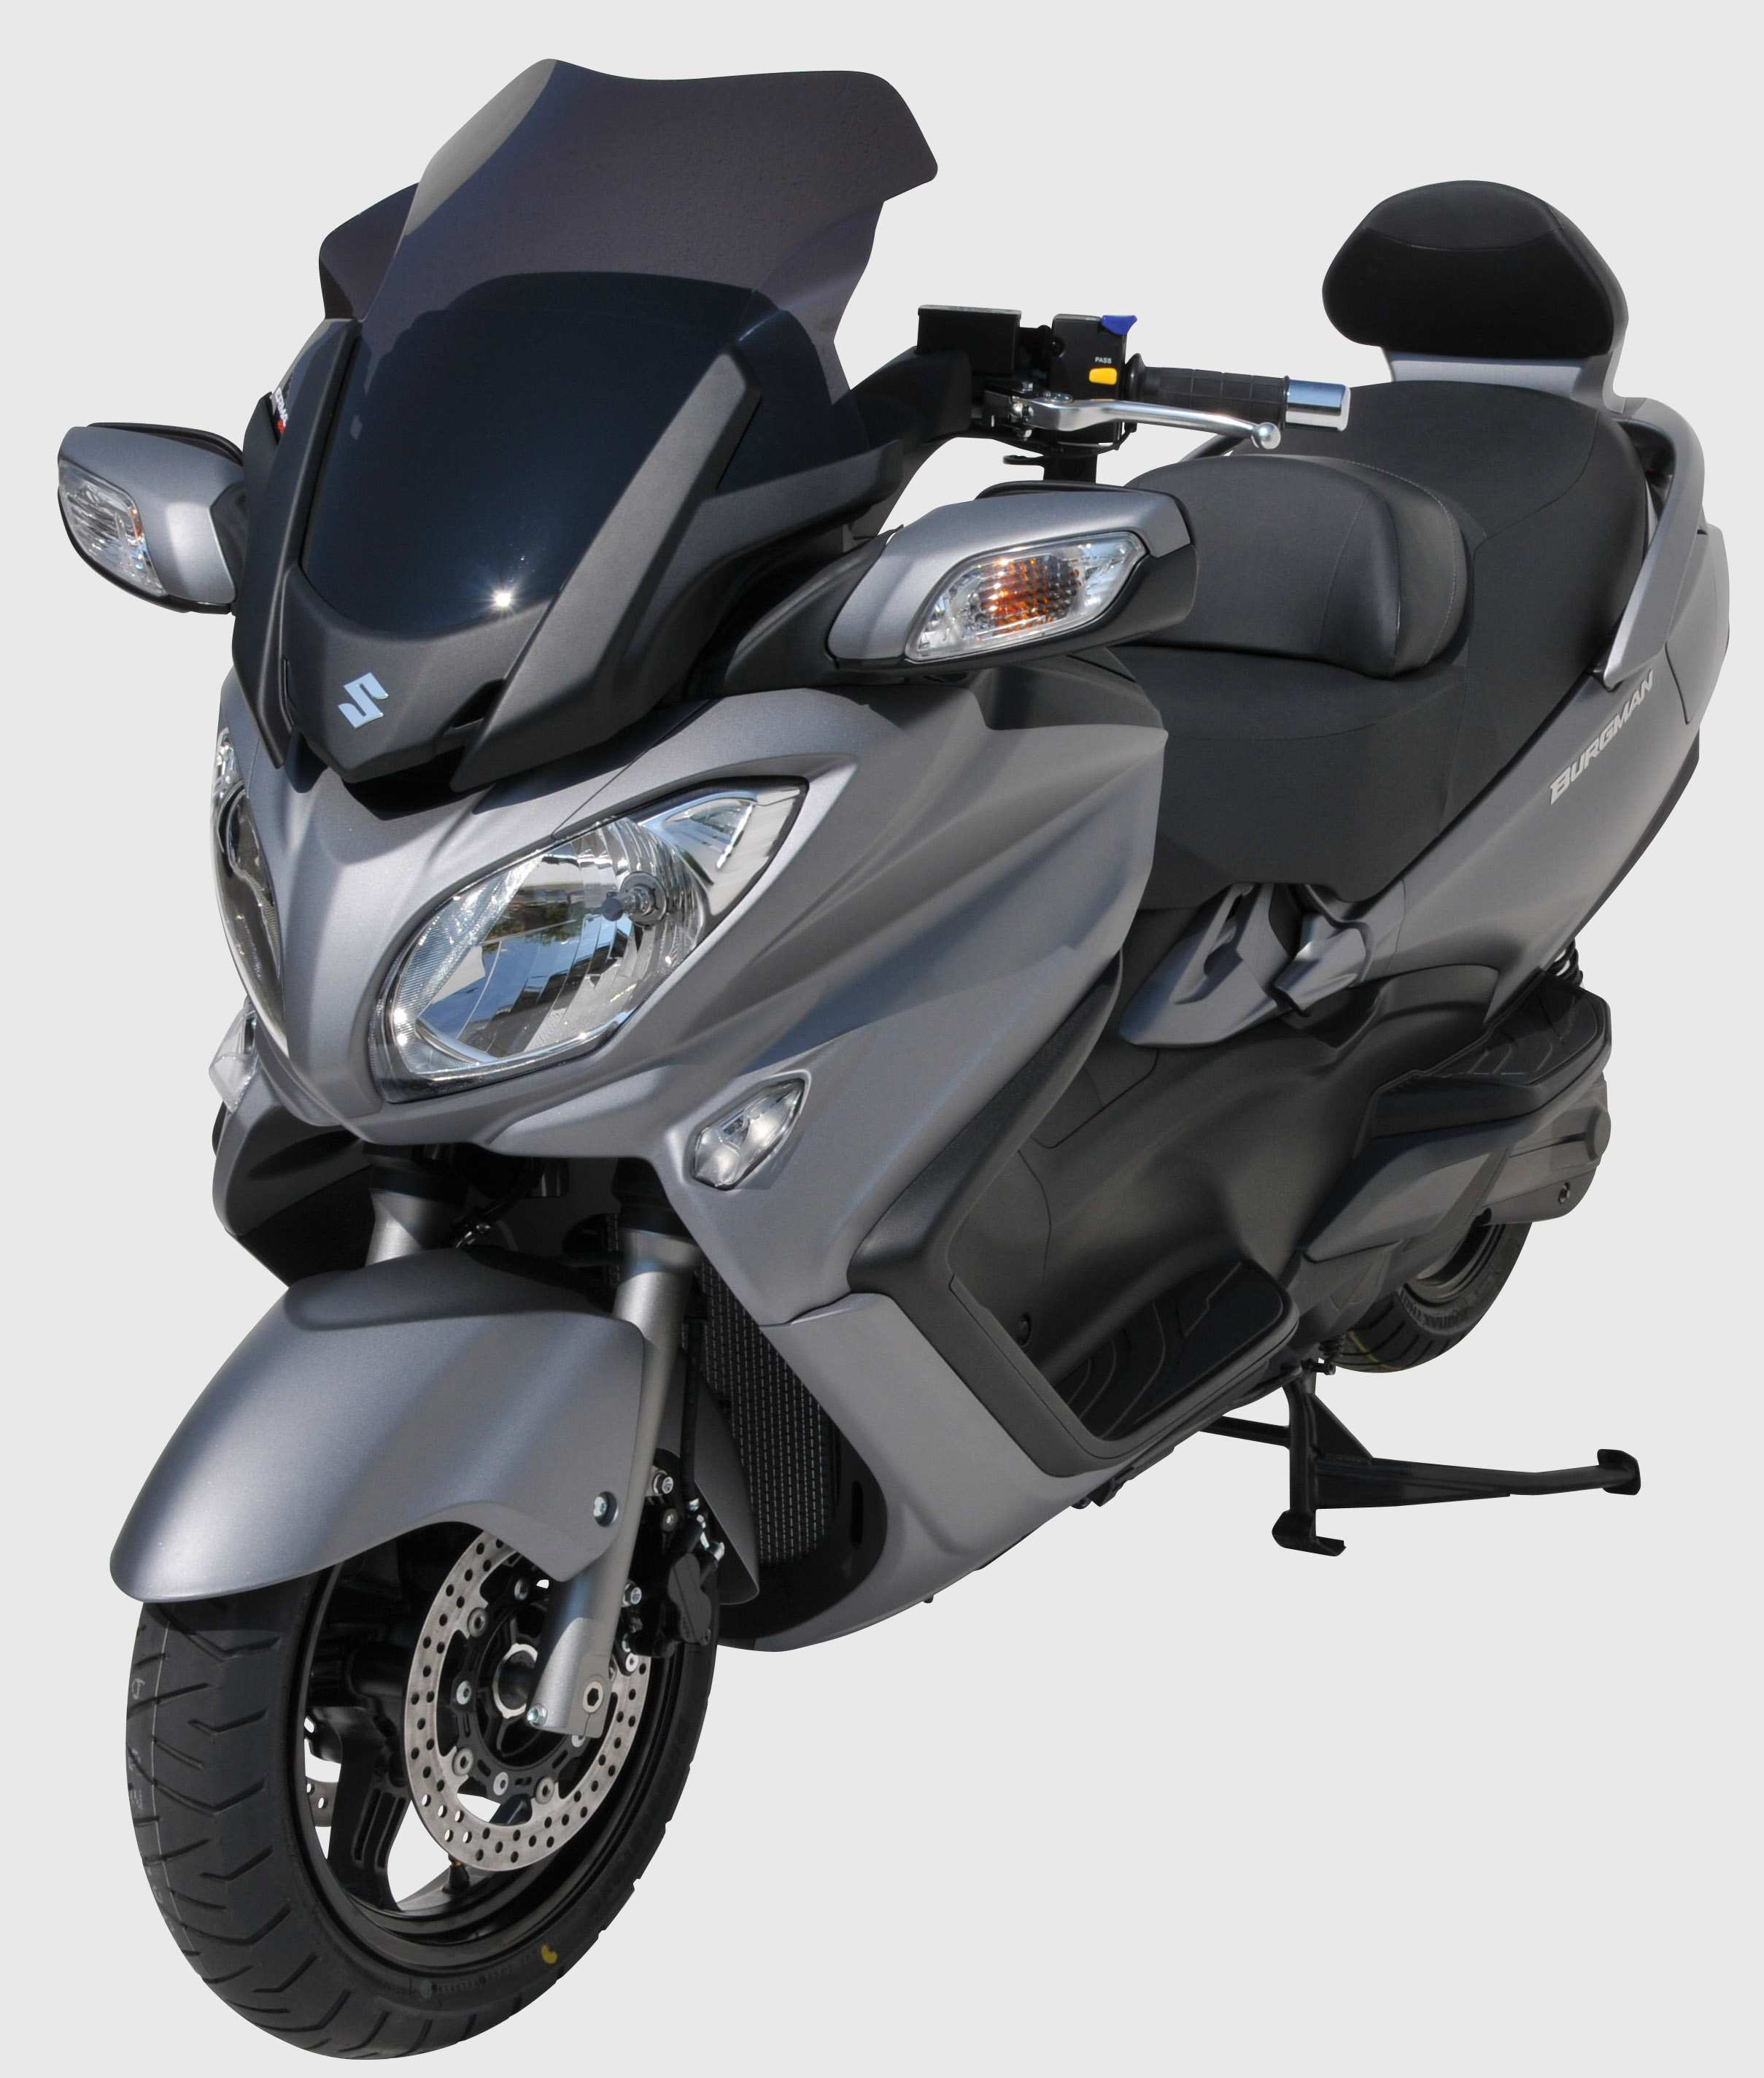 18 New 2019 Suzuki Burgman 650 Review by 2019 Suzuki Burgman 650